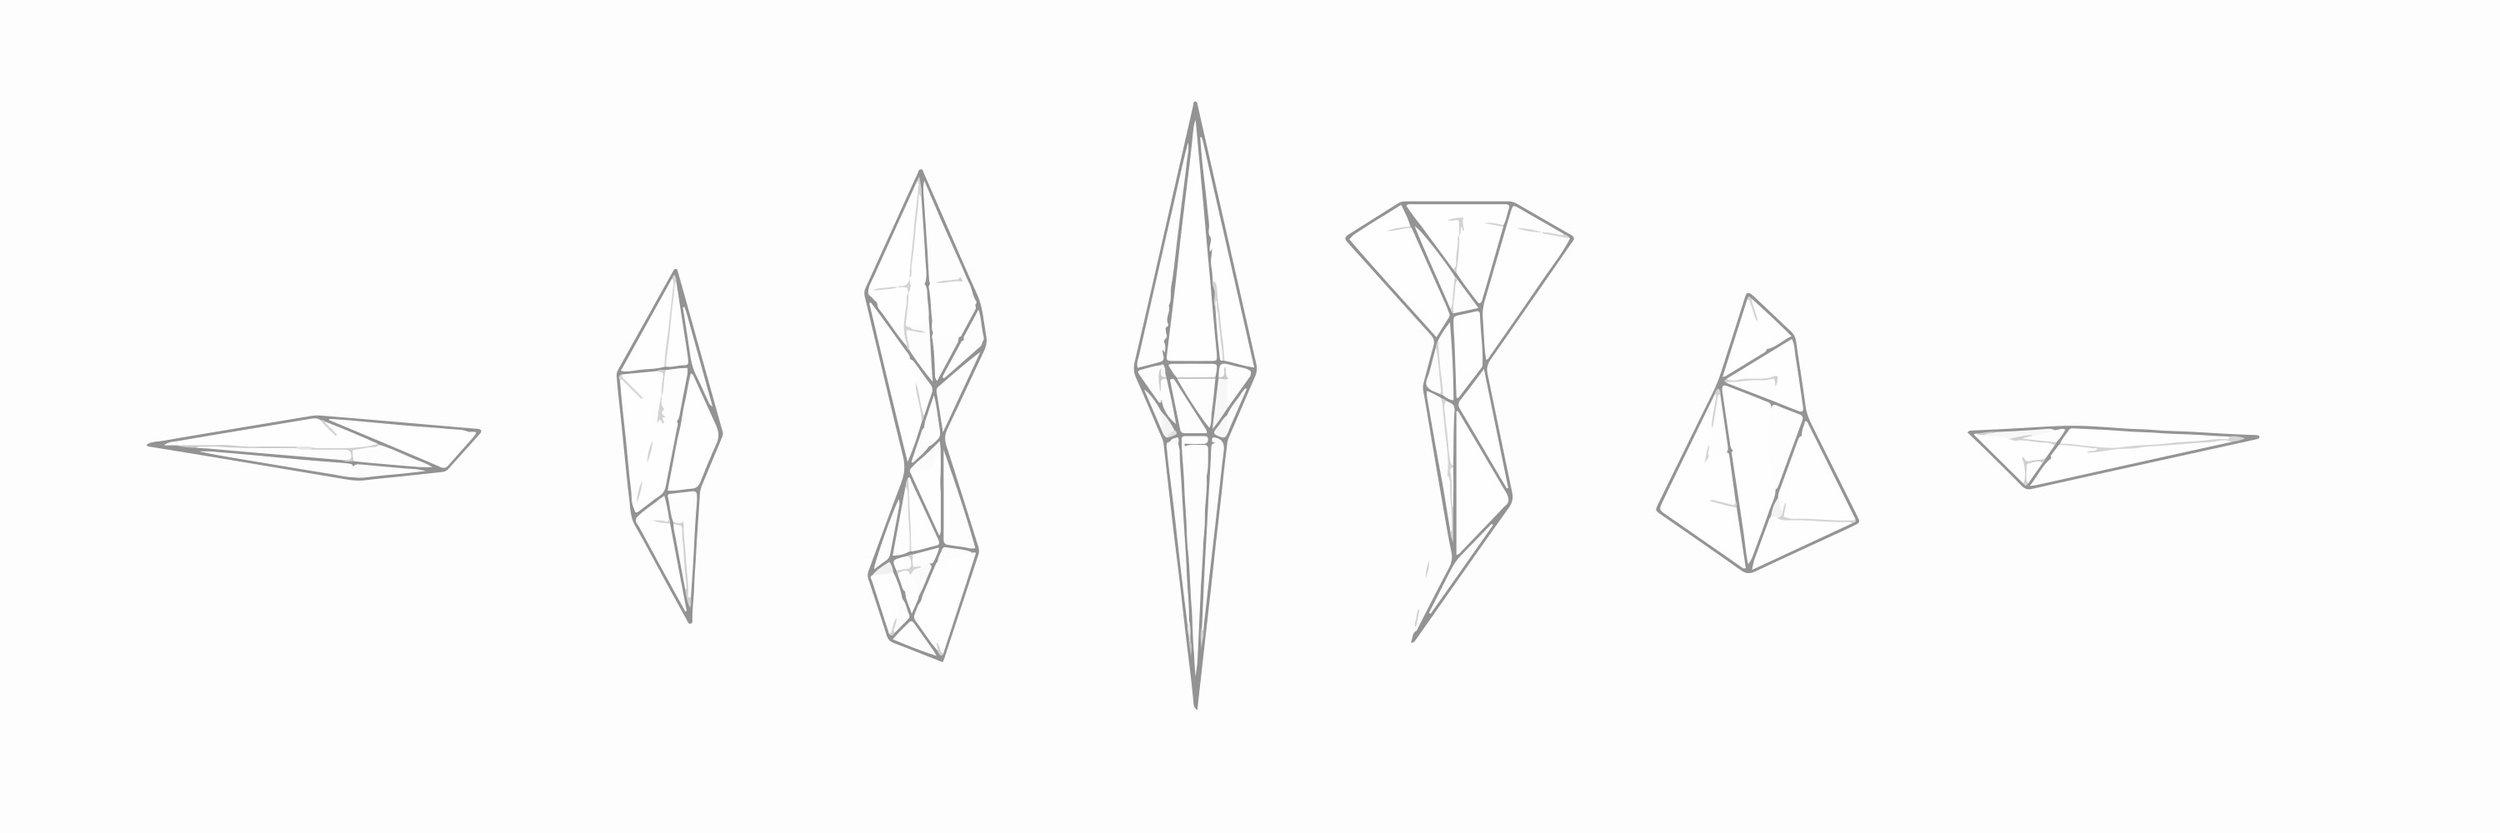 Jones-and-Partners-Kinetica-lighting-sketch.jpg